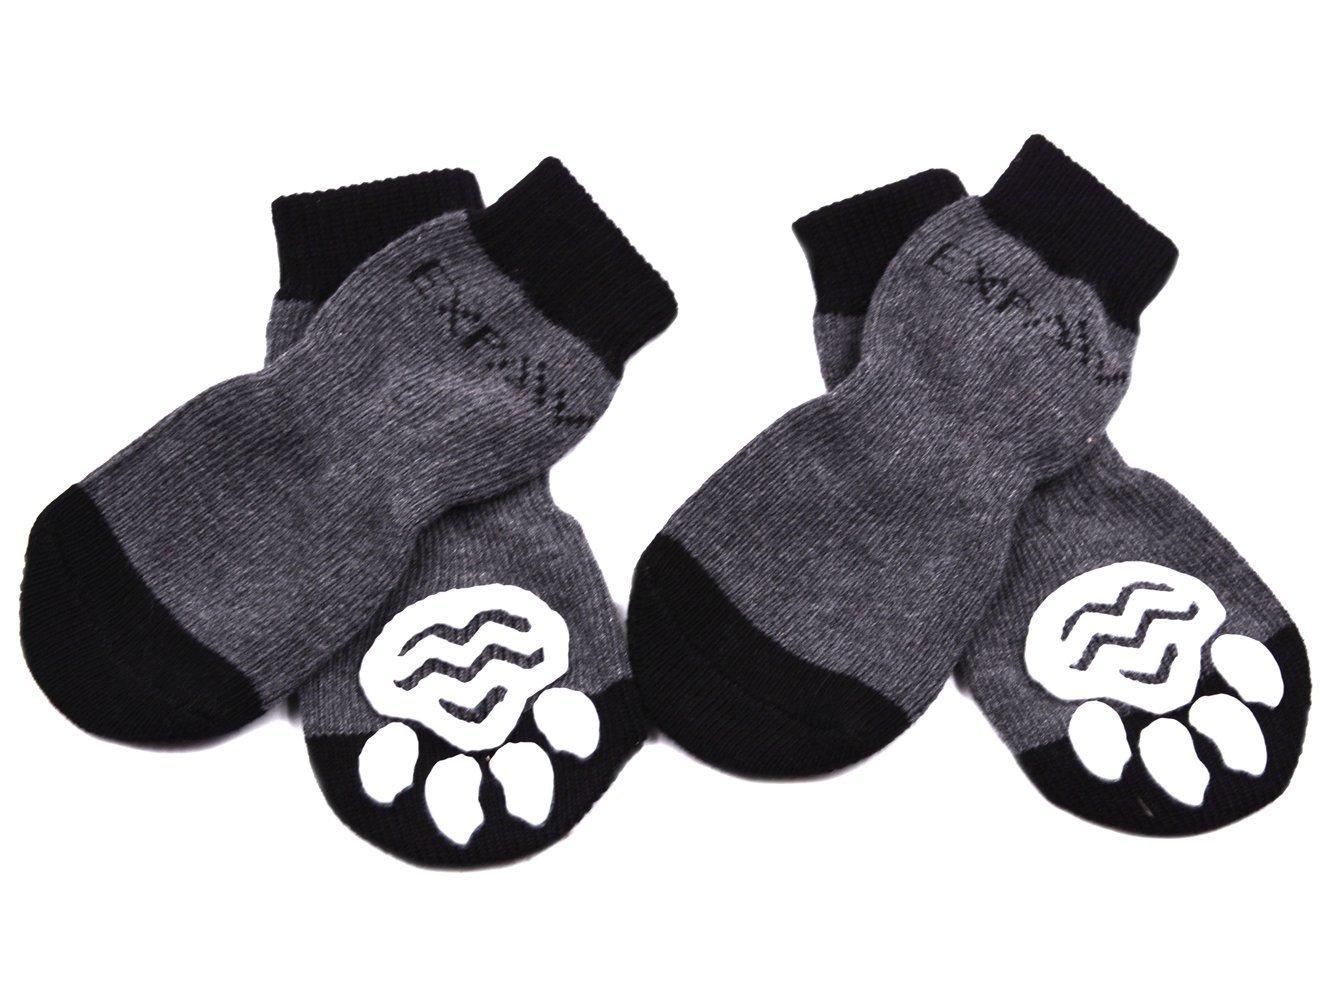 EXPAWLORER Anti-Slip Dog Socks for Indoor Wear, Paw Protection Sock001-BS-1